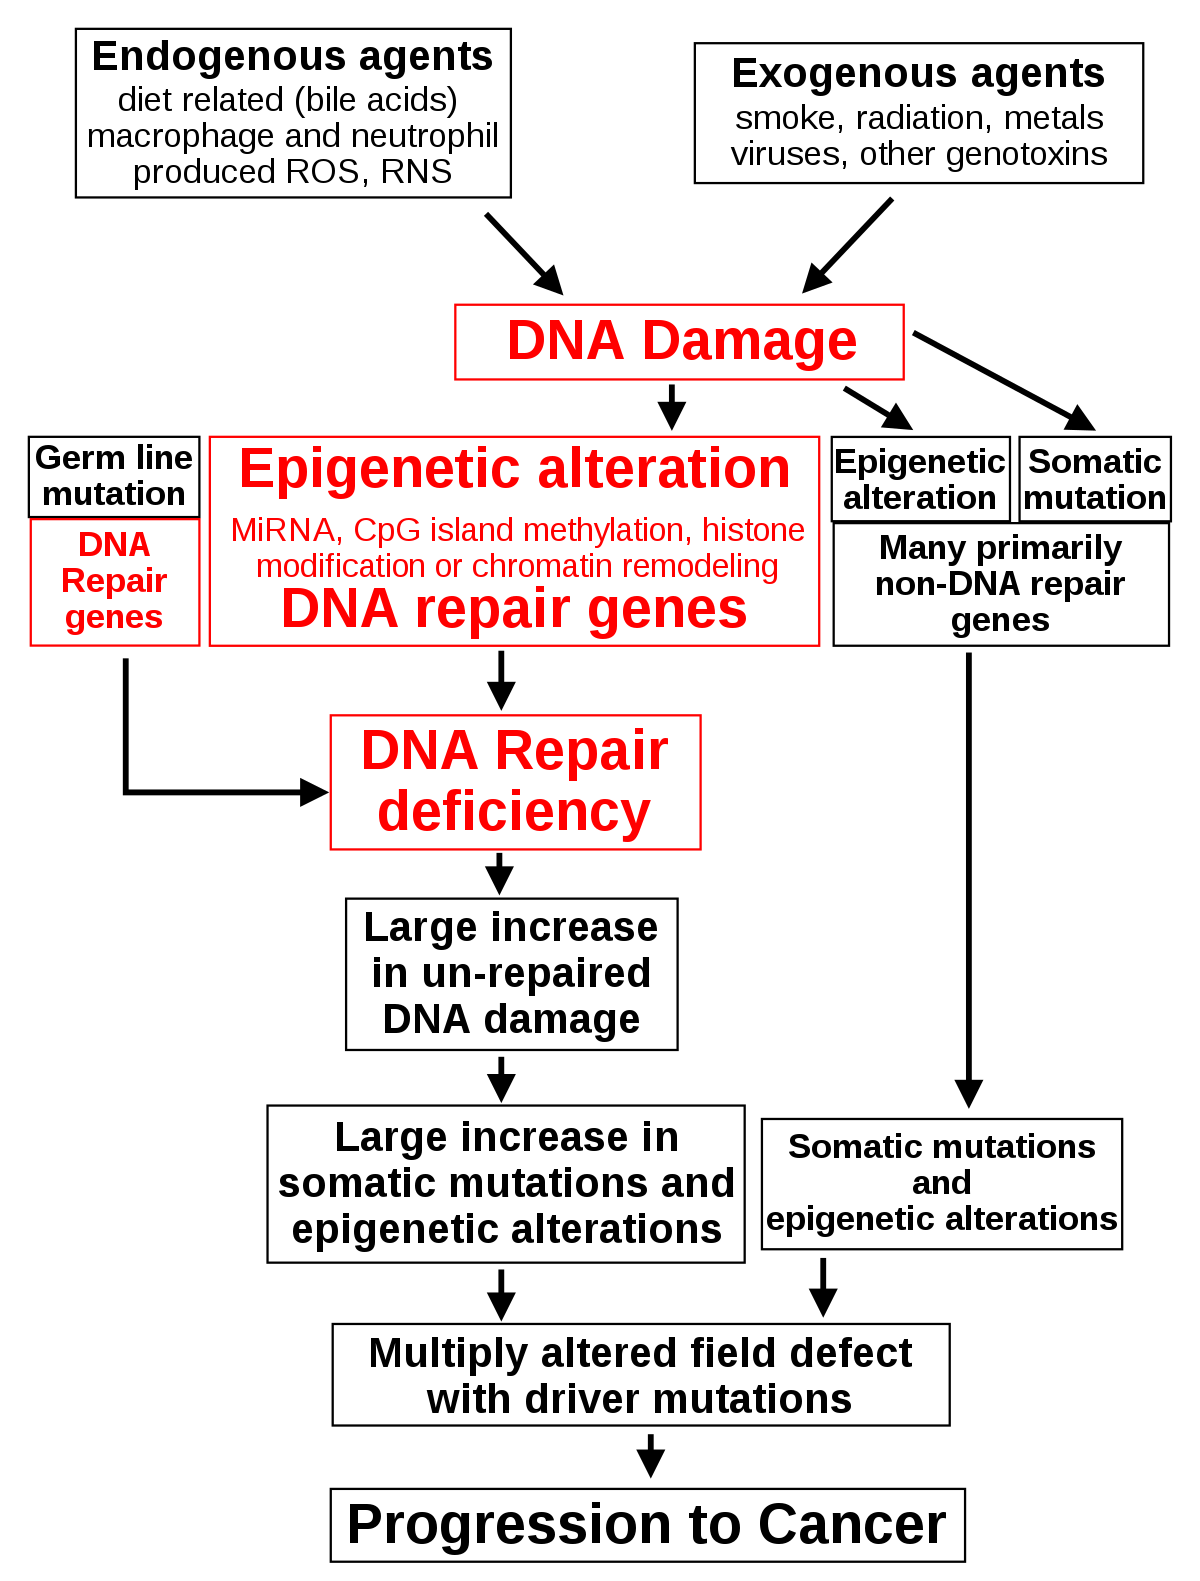 Onkológiai kislexikon (1.): kifejezések